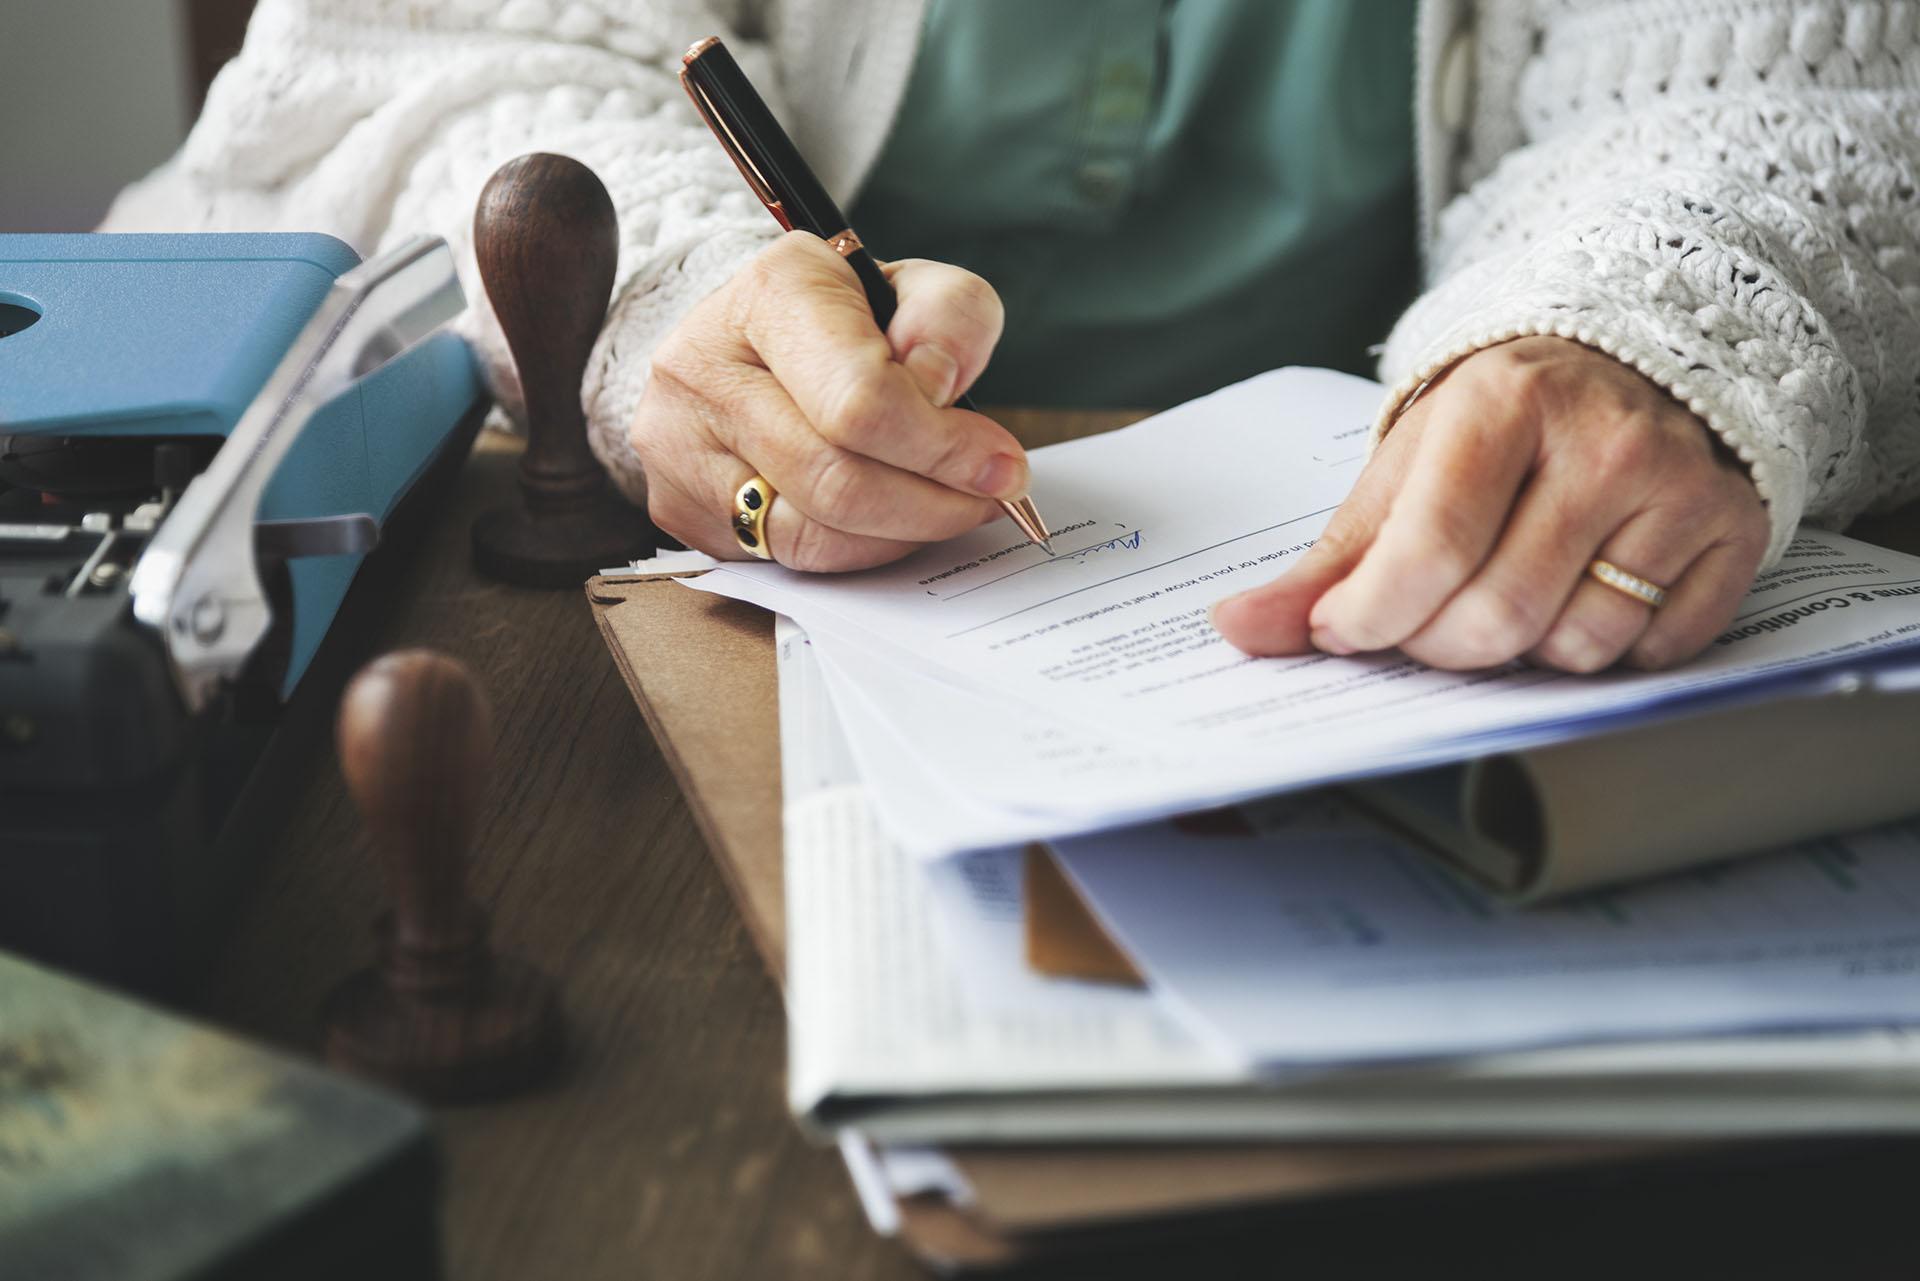 Does Life Insurance Go Through Probate? - Texas Republic